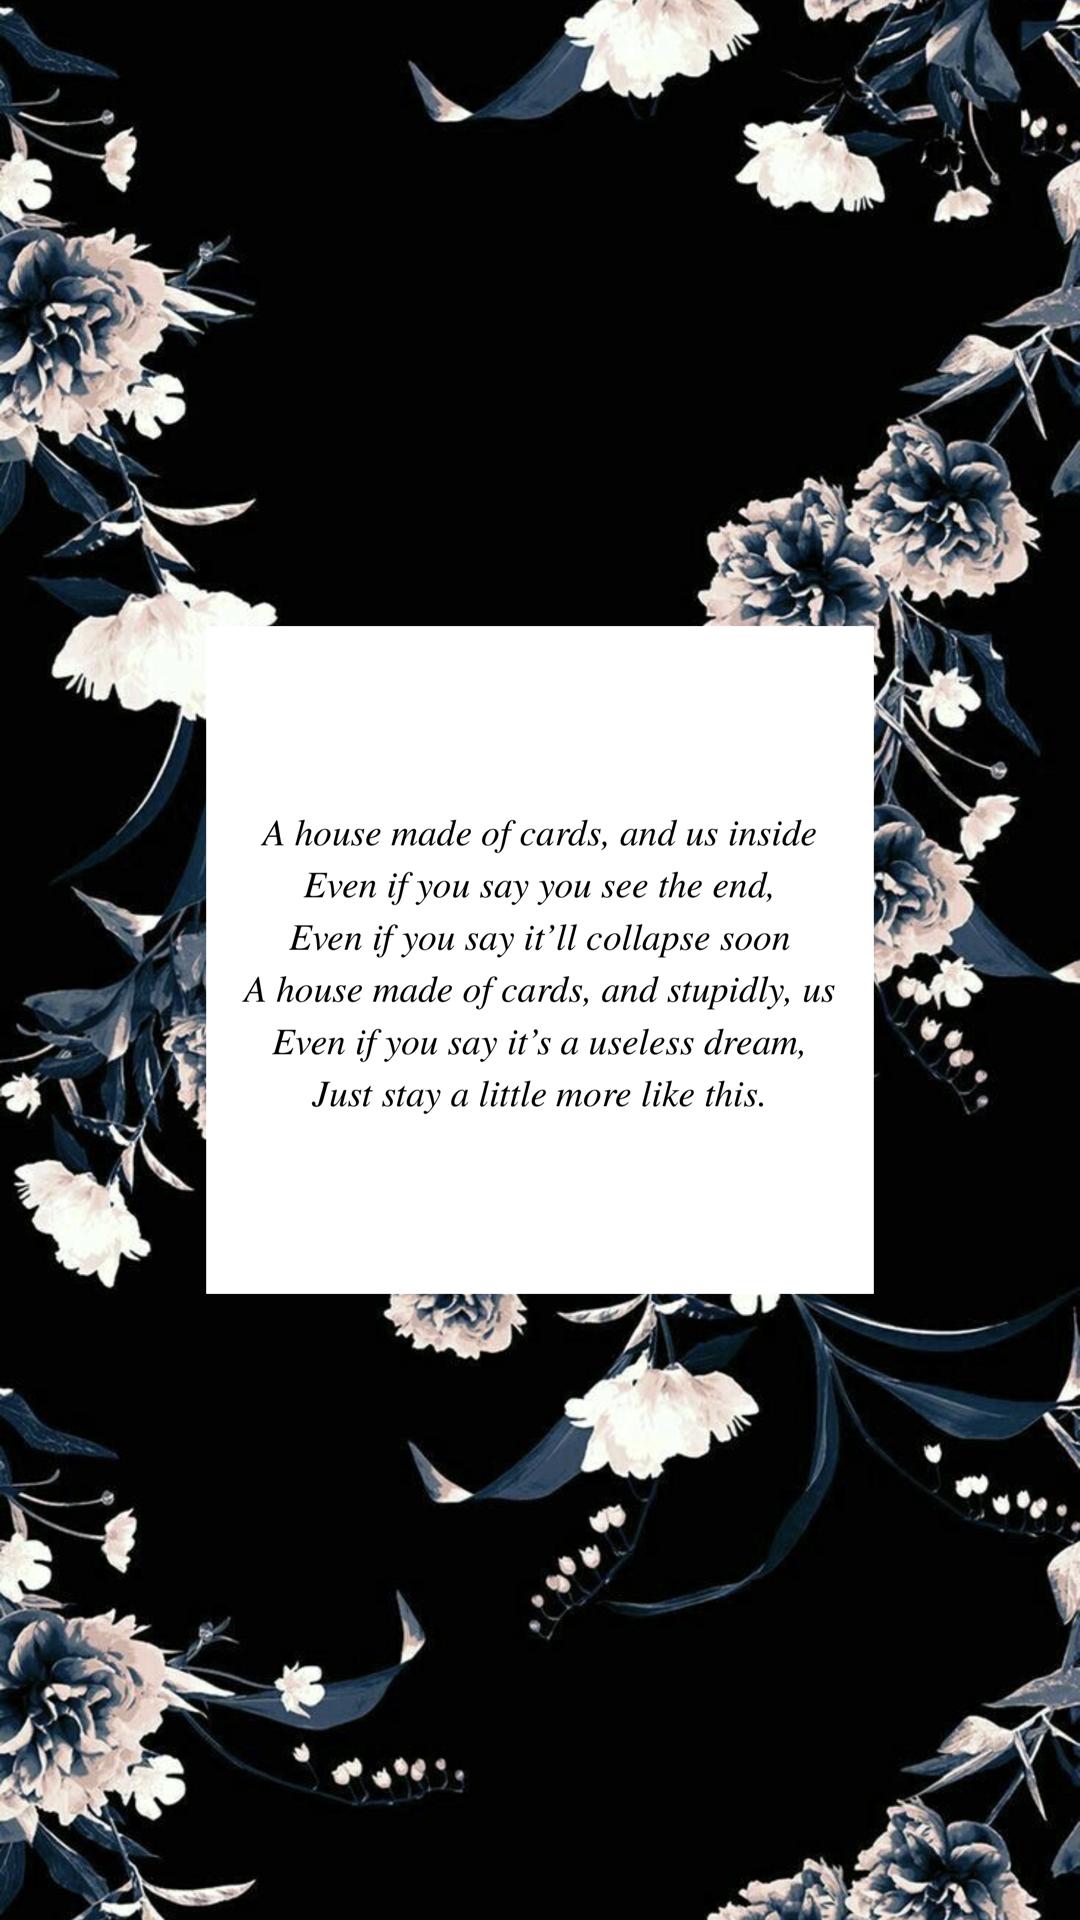 Bts House Of Cards Lyrics Wallpaper Floral Bts Houseofcards